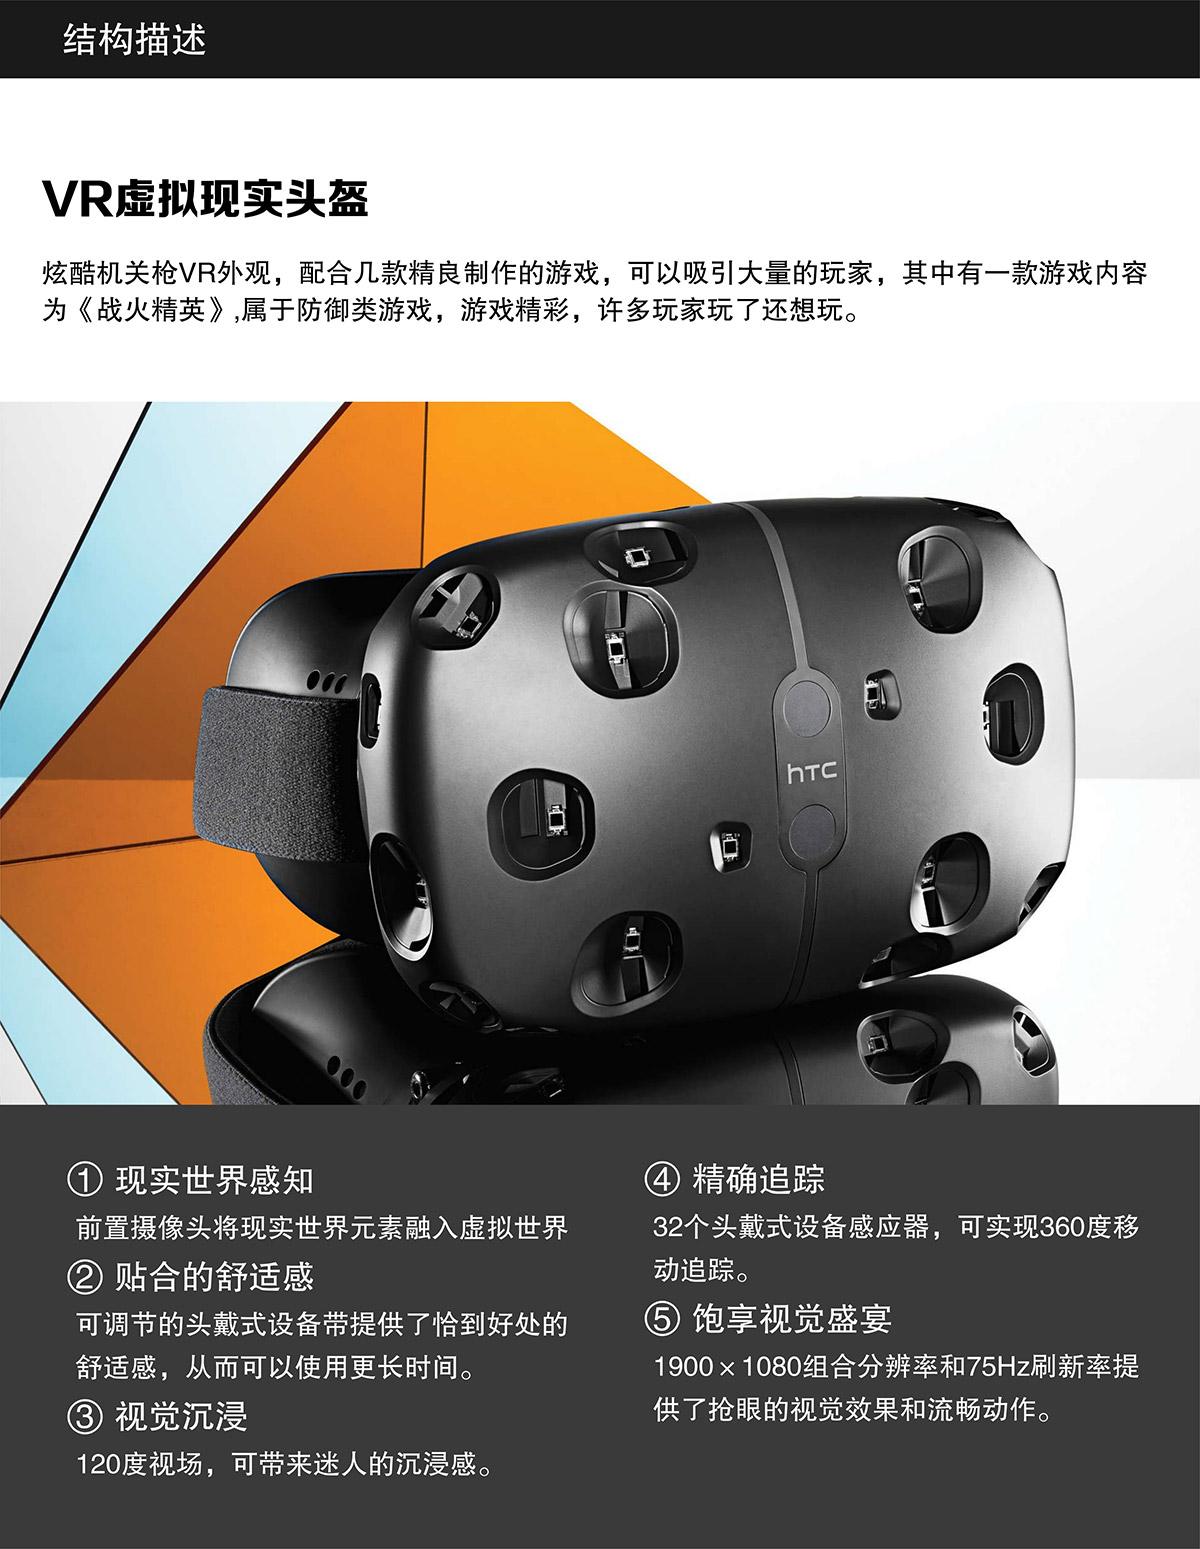 安全体验VR虚拟机枪结构描述.jpg